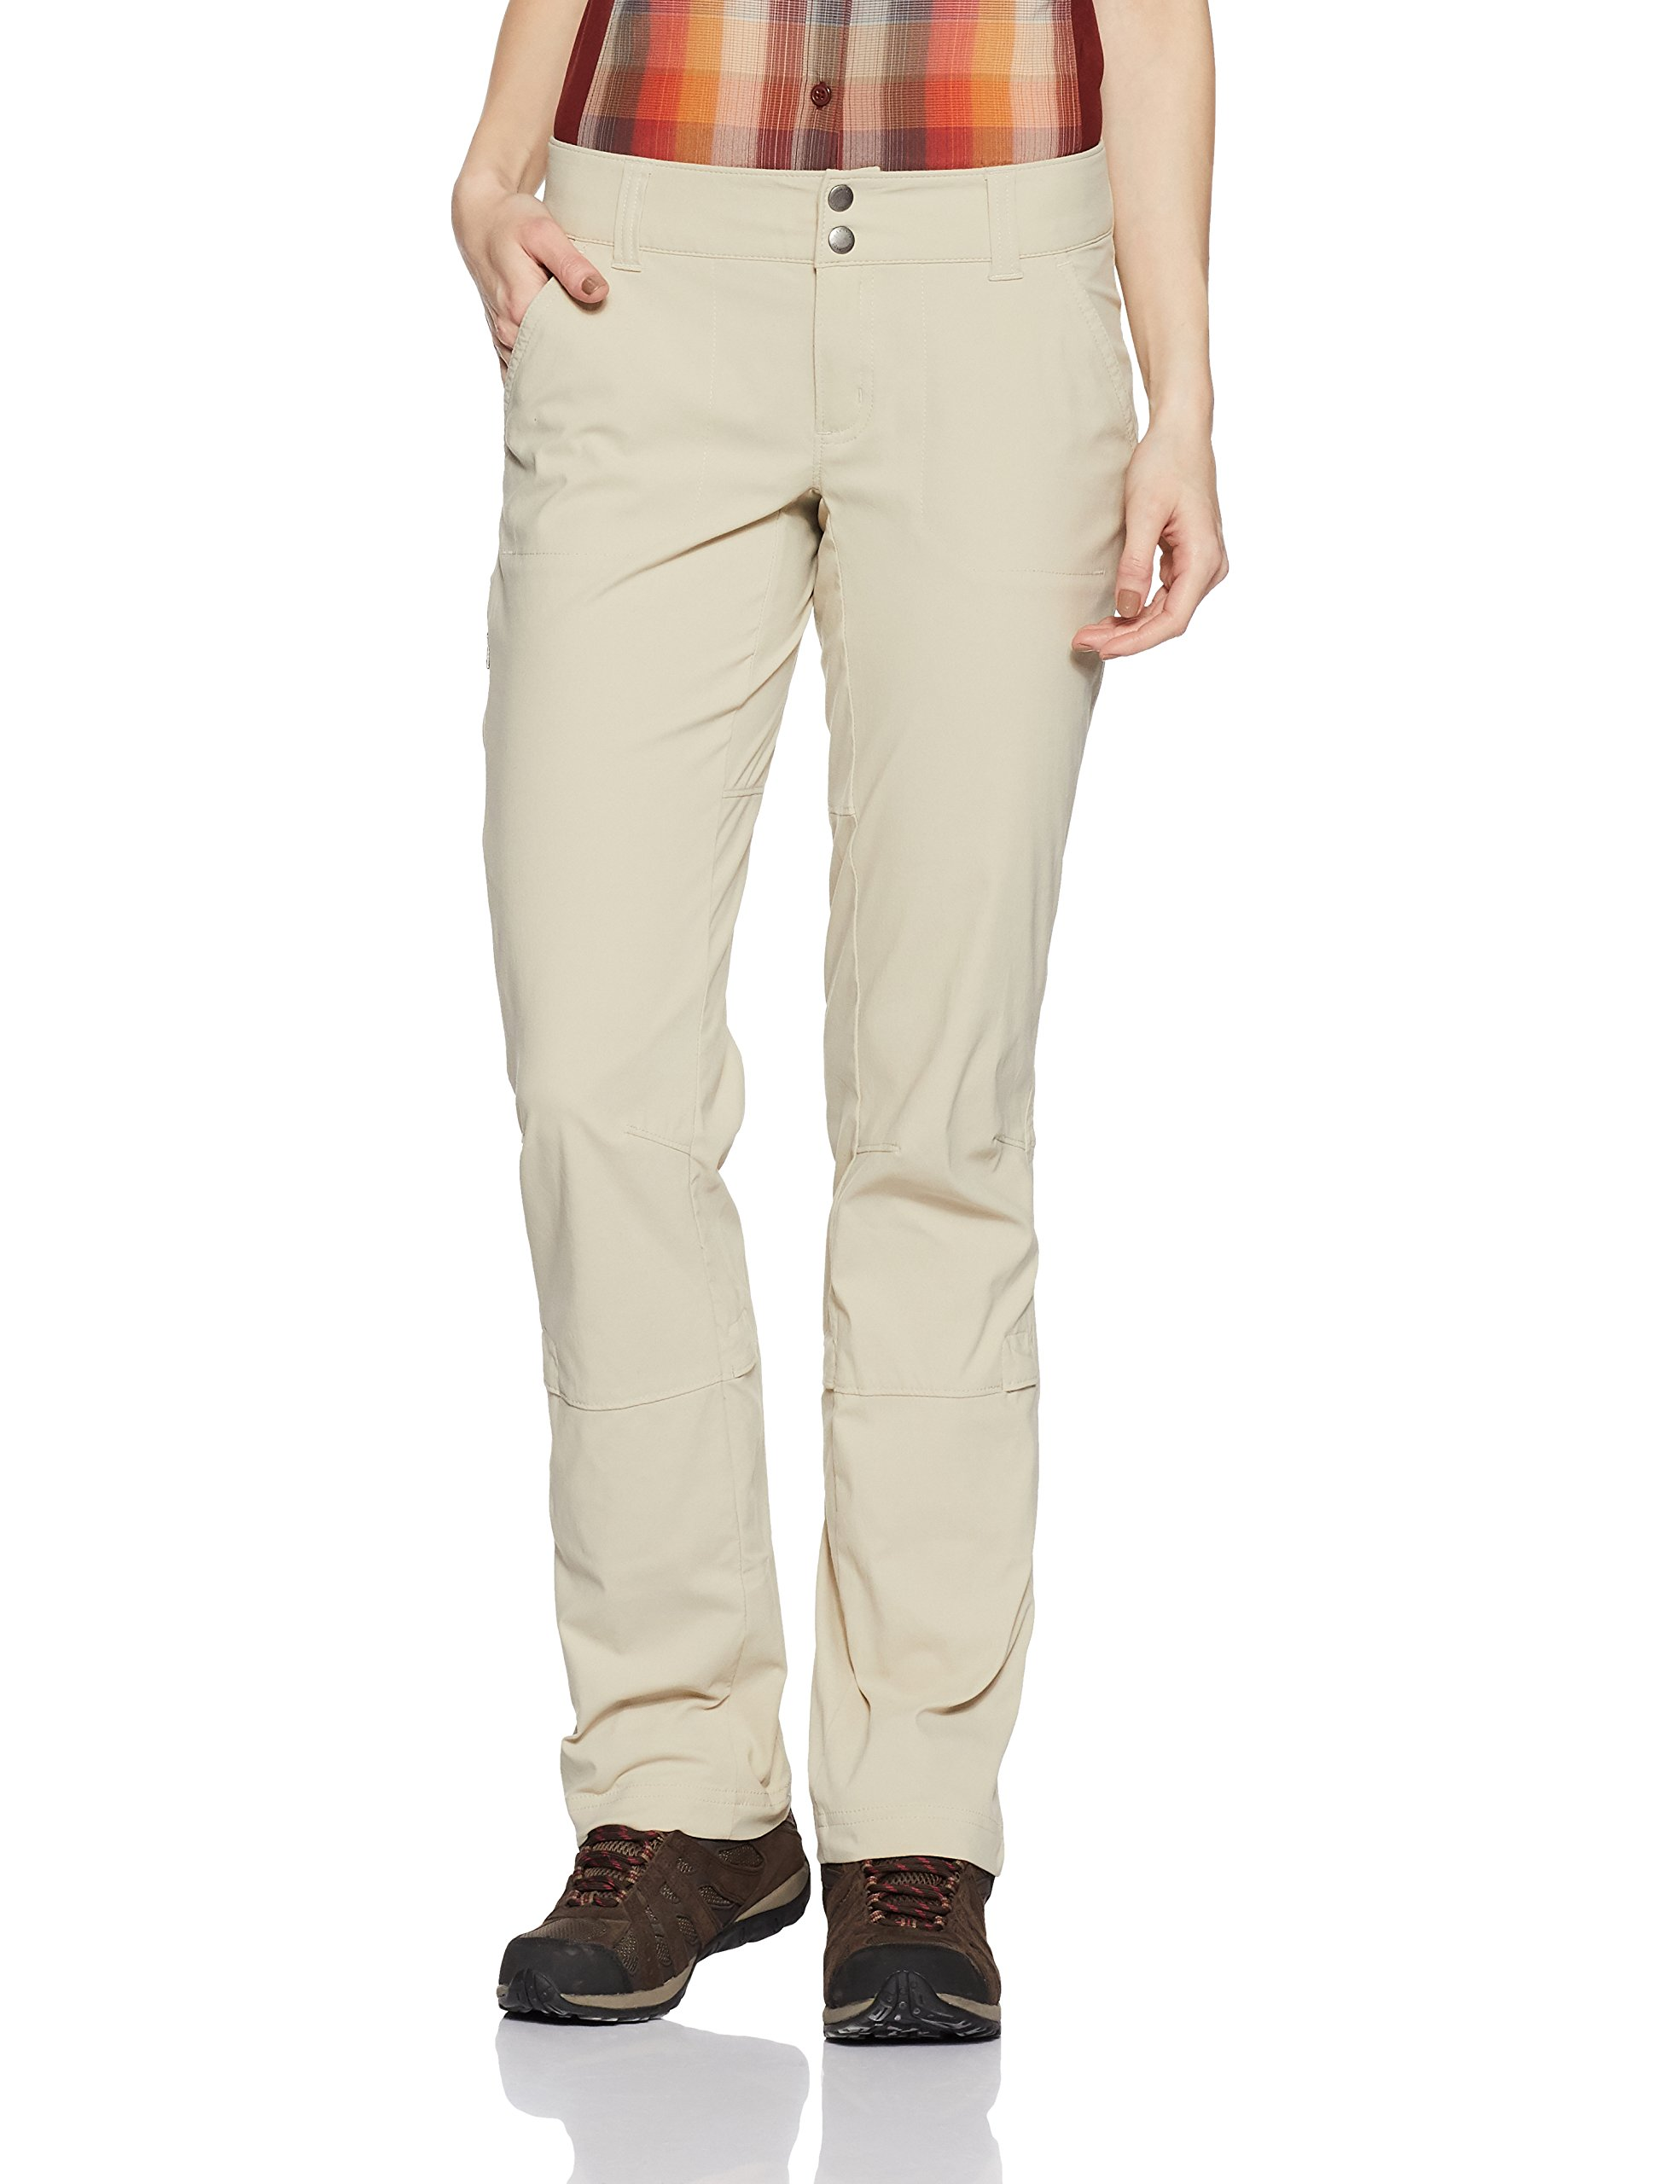 Columbia Sportswear Women's Saturday Trail Pants, Fossil,4 Regular by Columbia